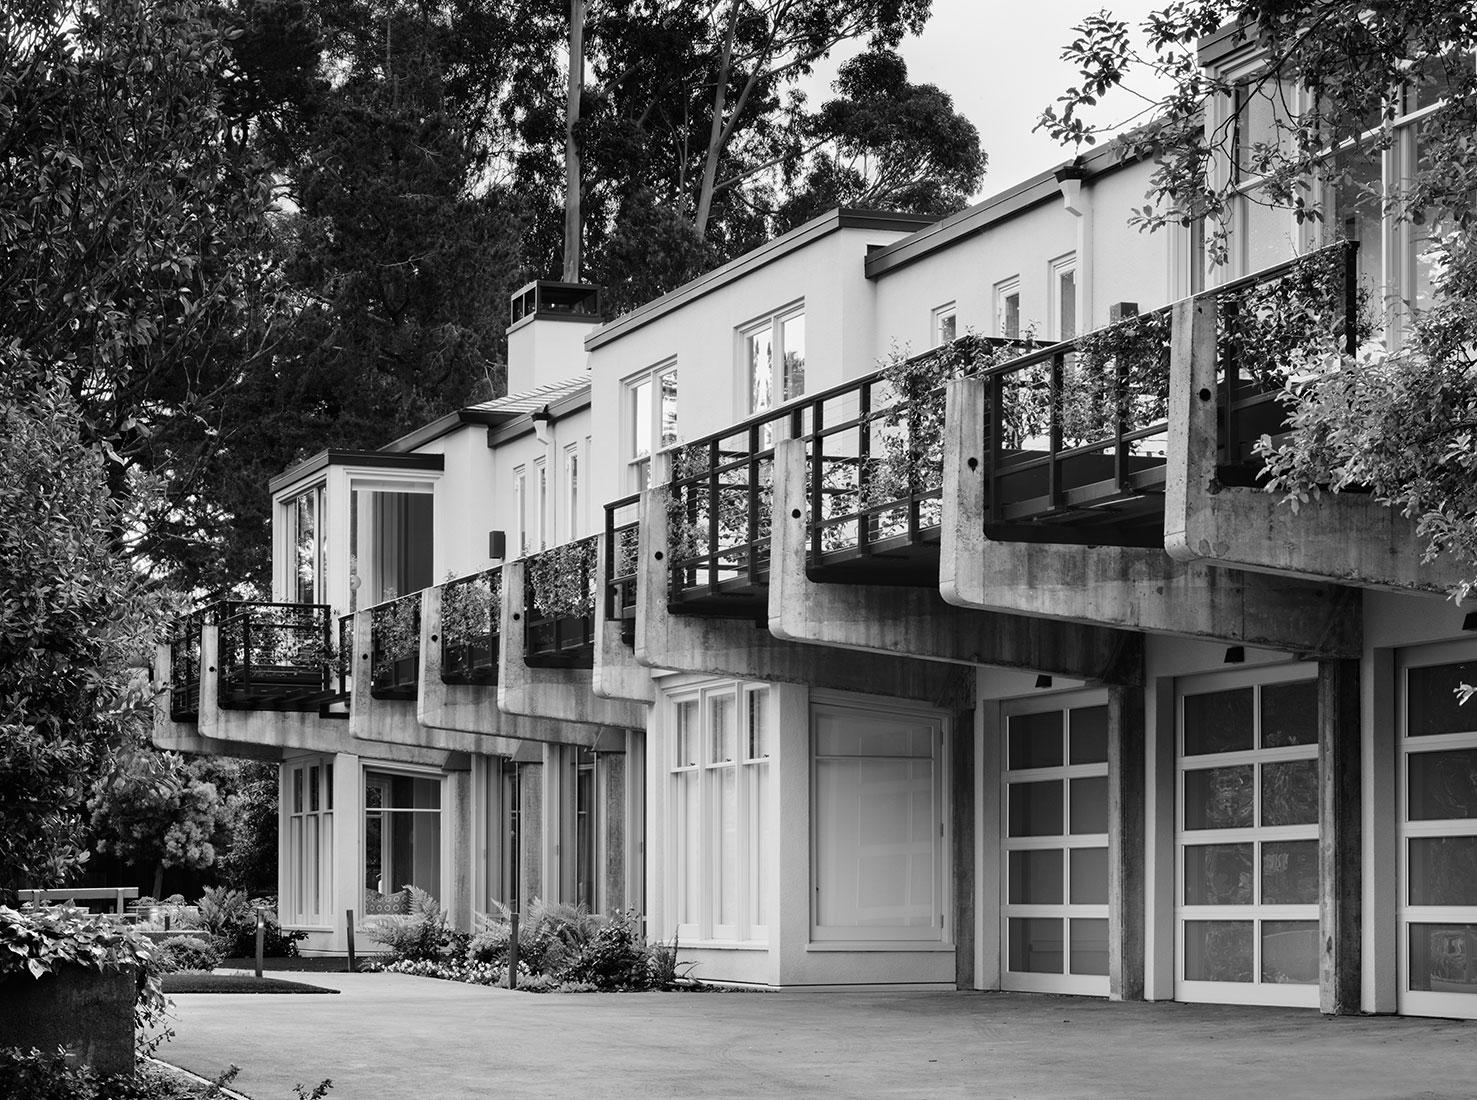 Бруталистская архитектура фото